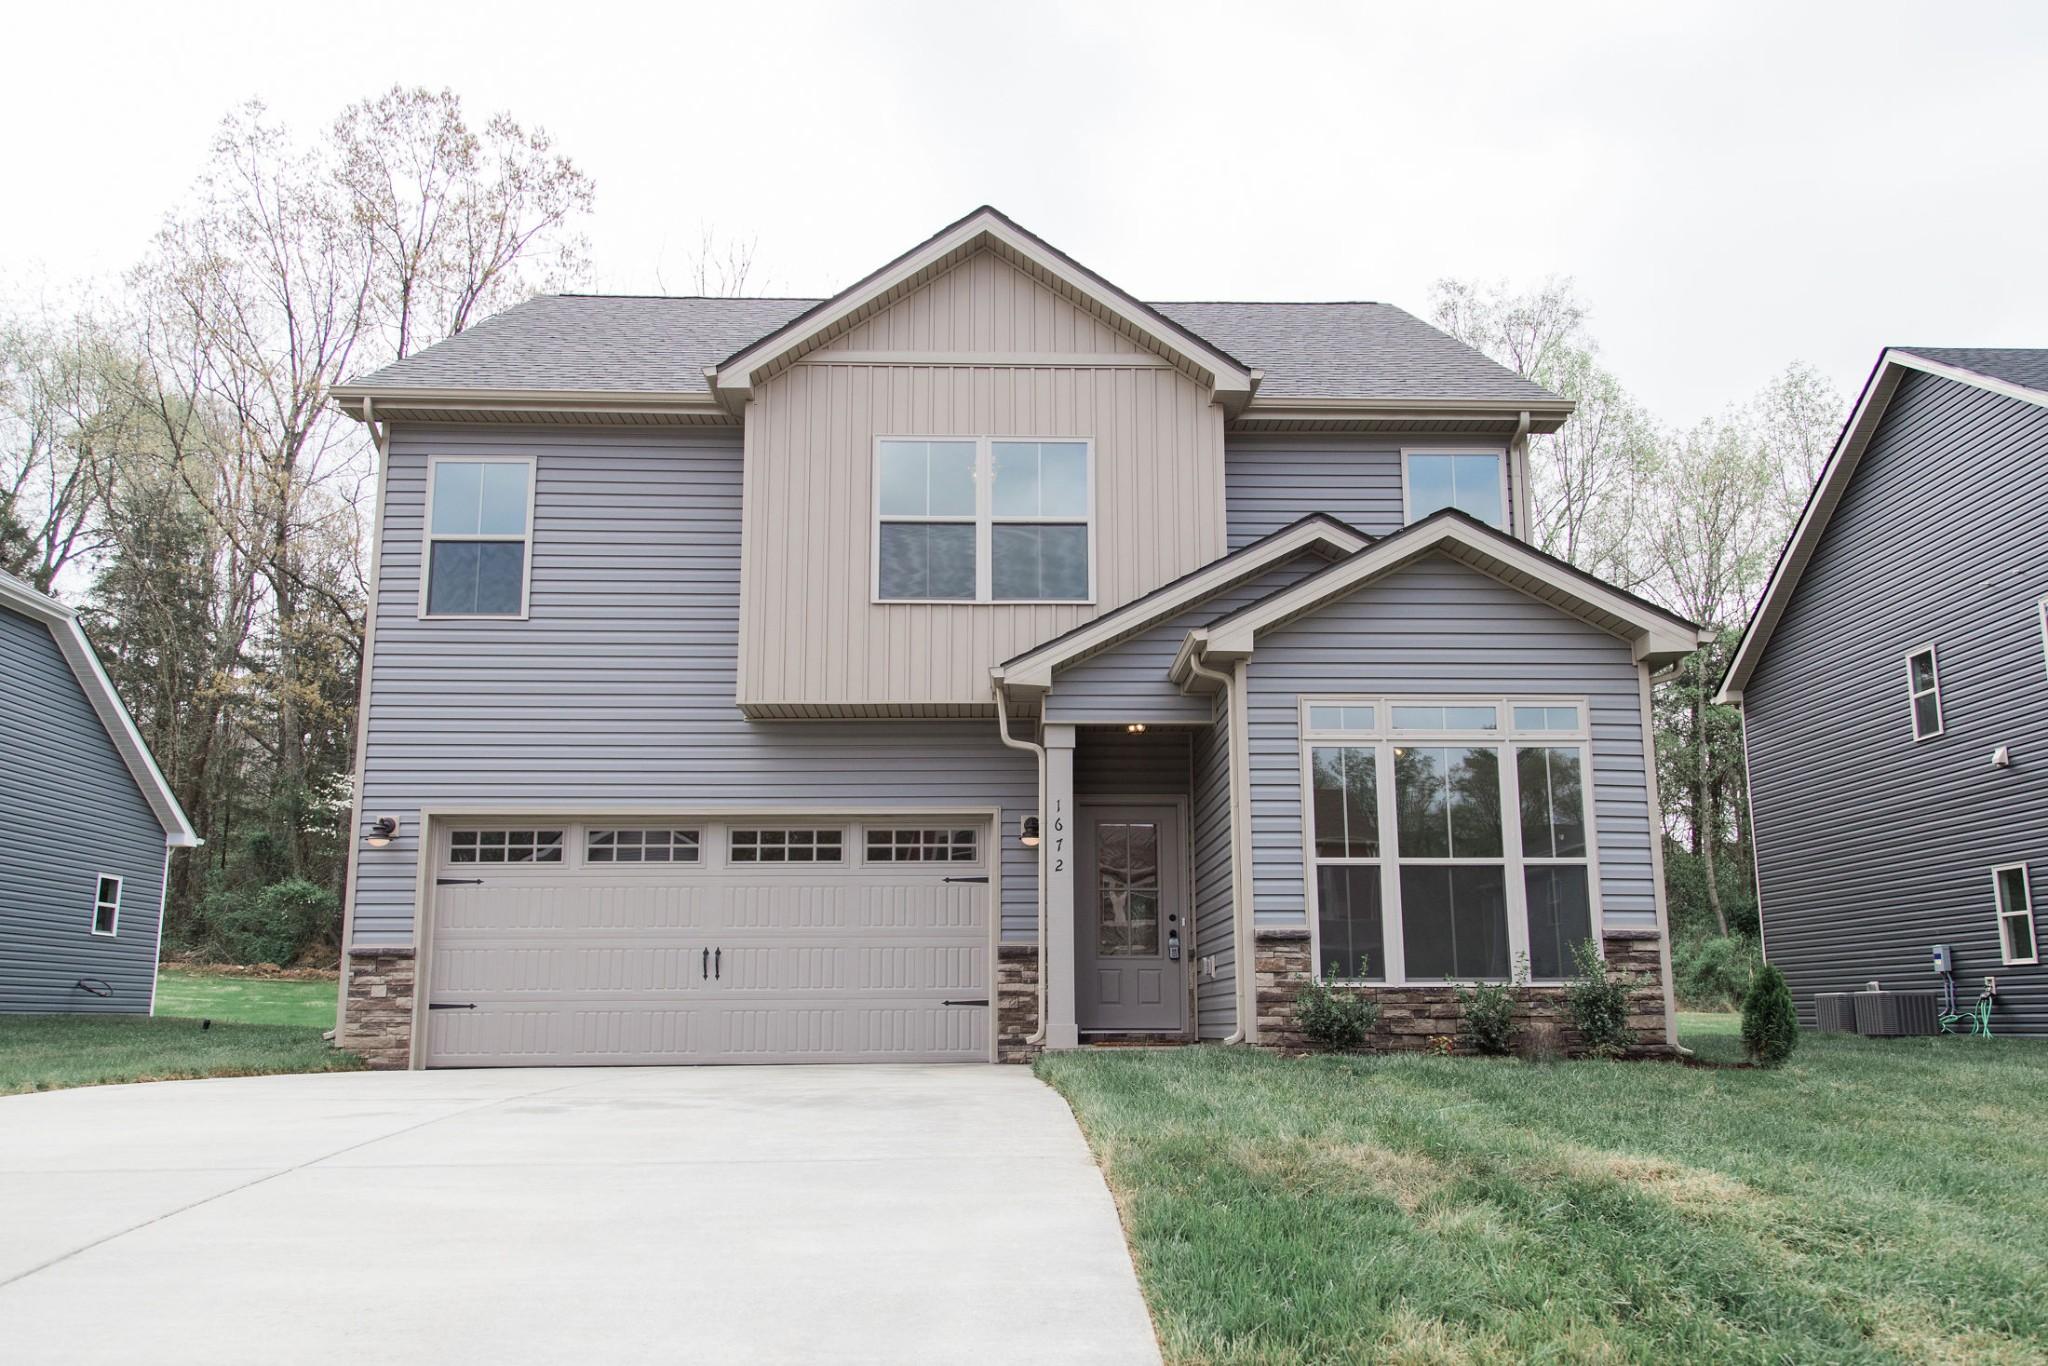 1672 Rains Rd, Clarksville, TN 37042 - Clarksville, TN real estate listing